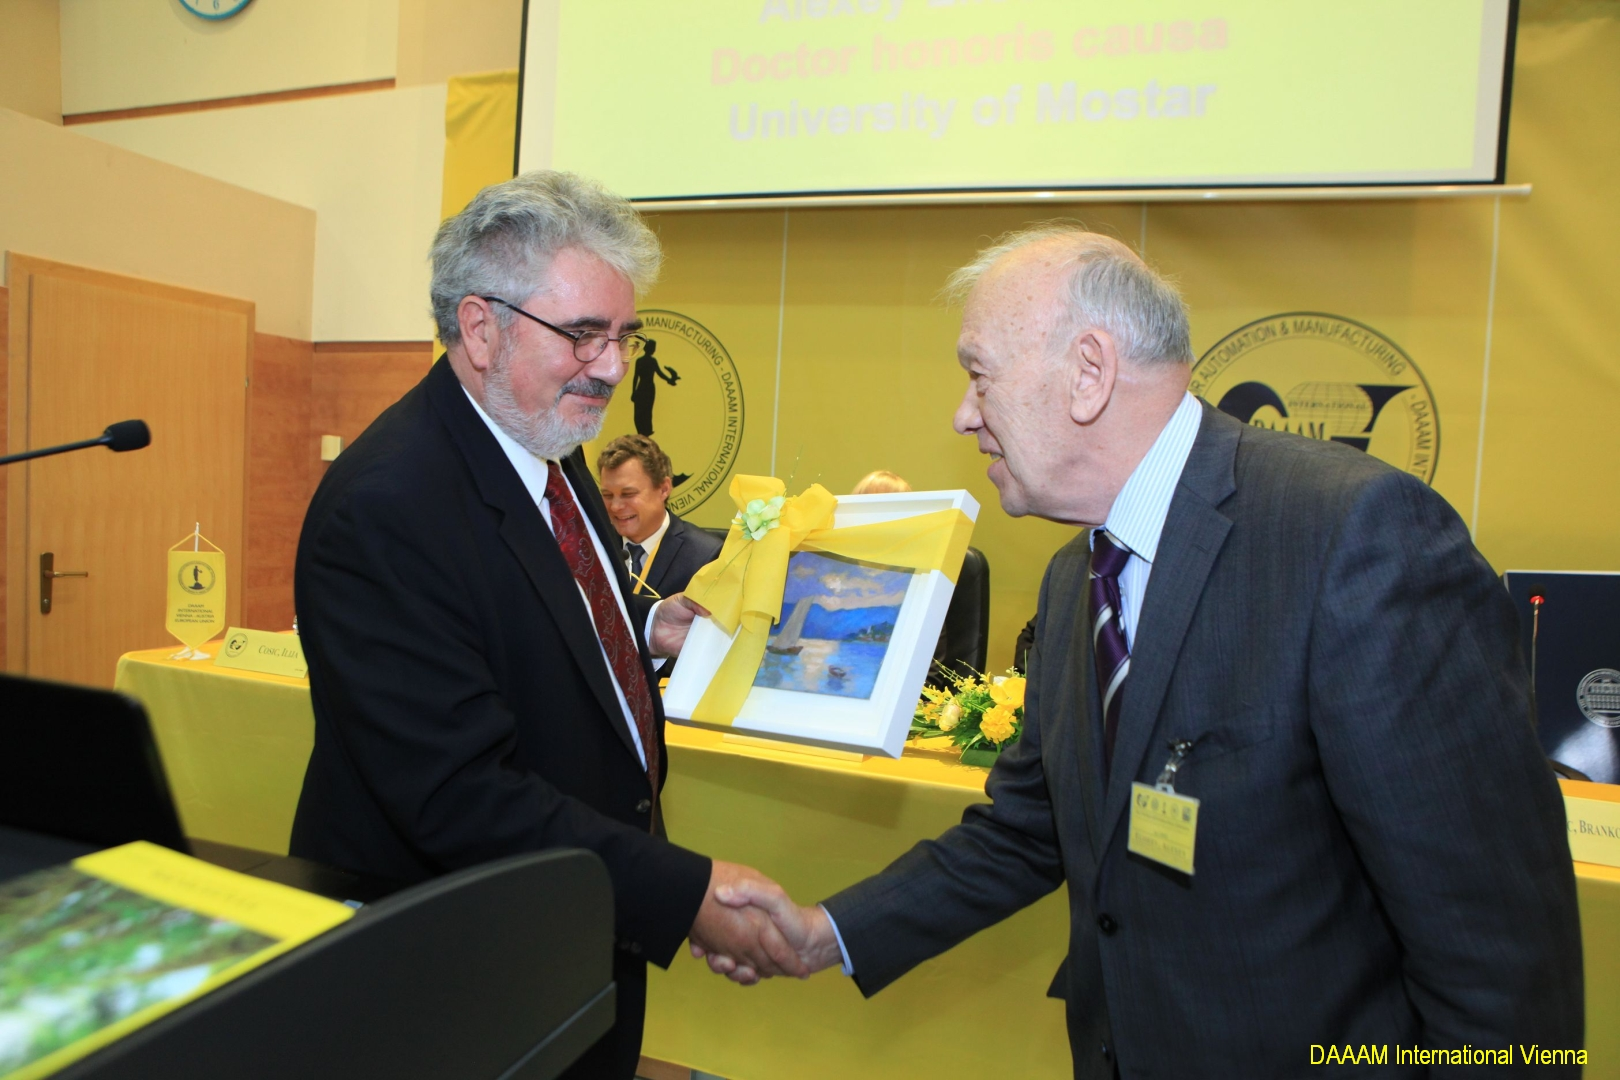 DAAAM_2016_Mostar_06_Professor_and_Cosmonaut_Alexey_Eliseev_Doctor_honors_causa_026